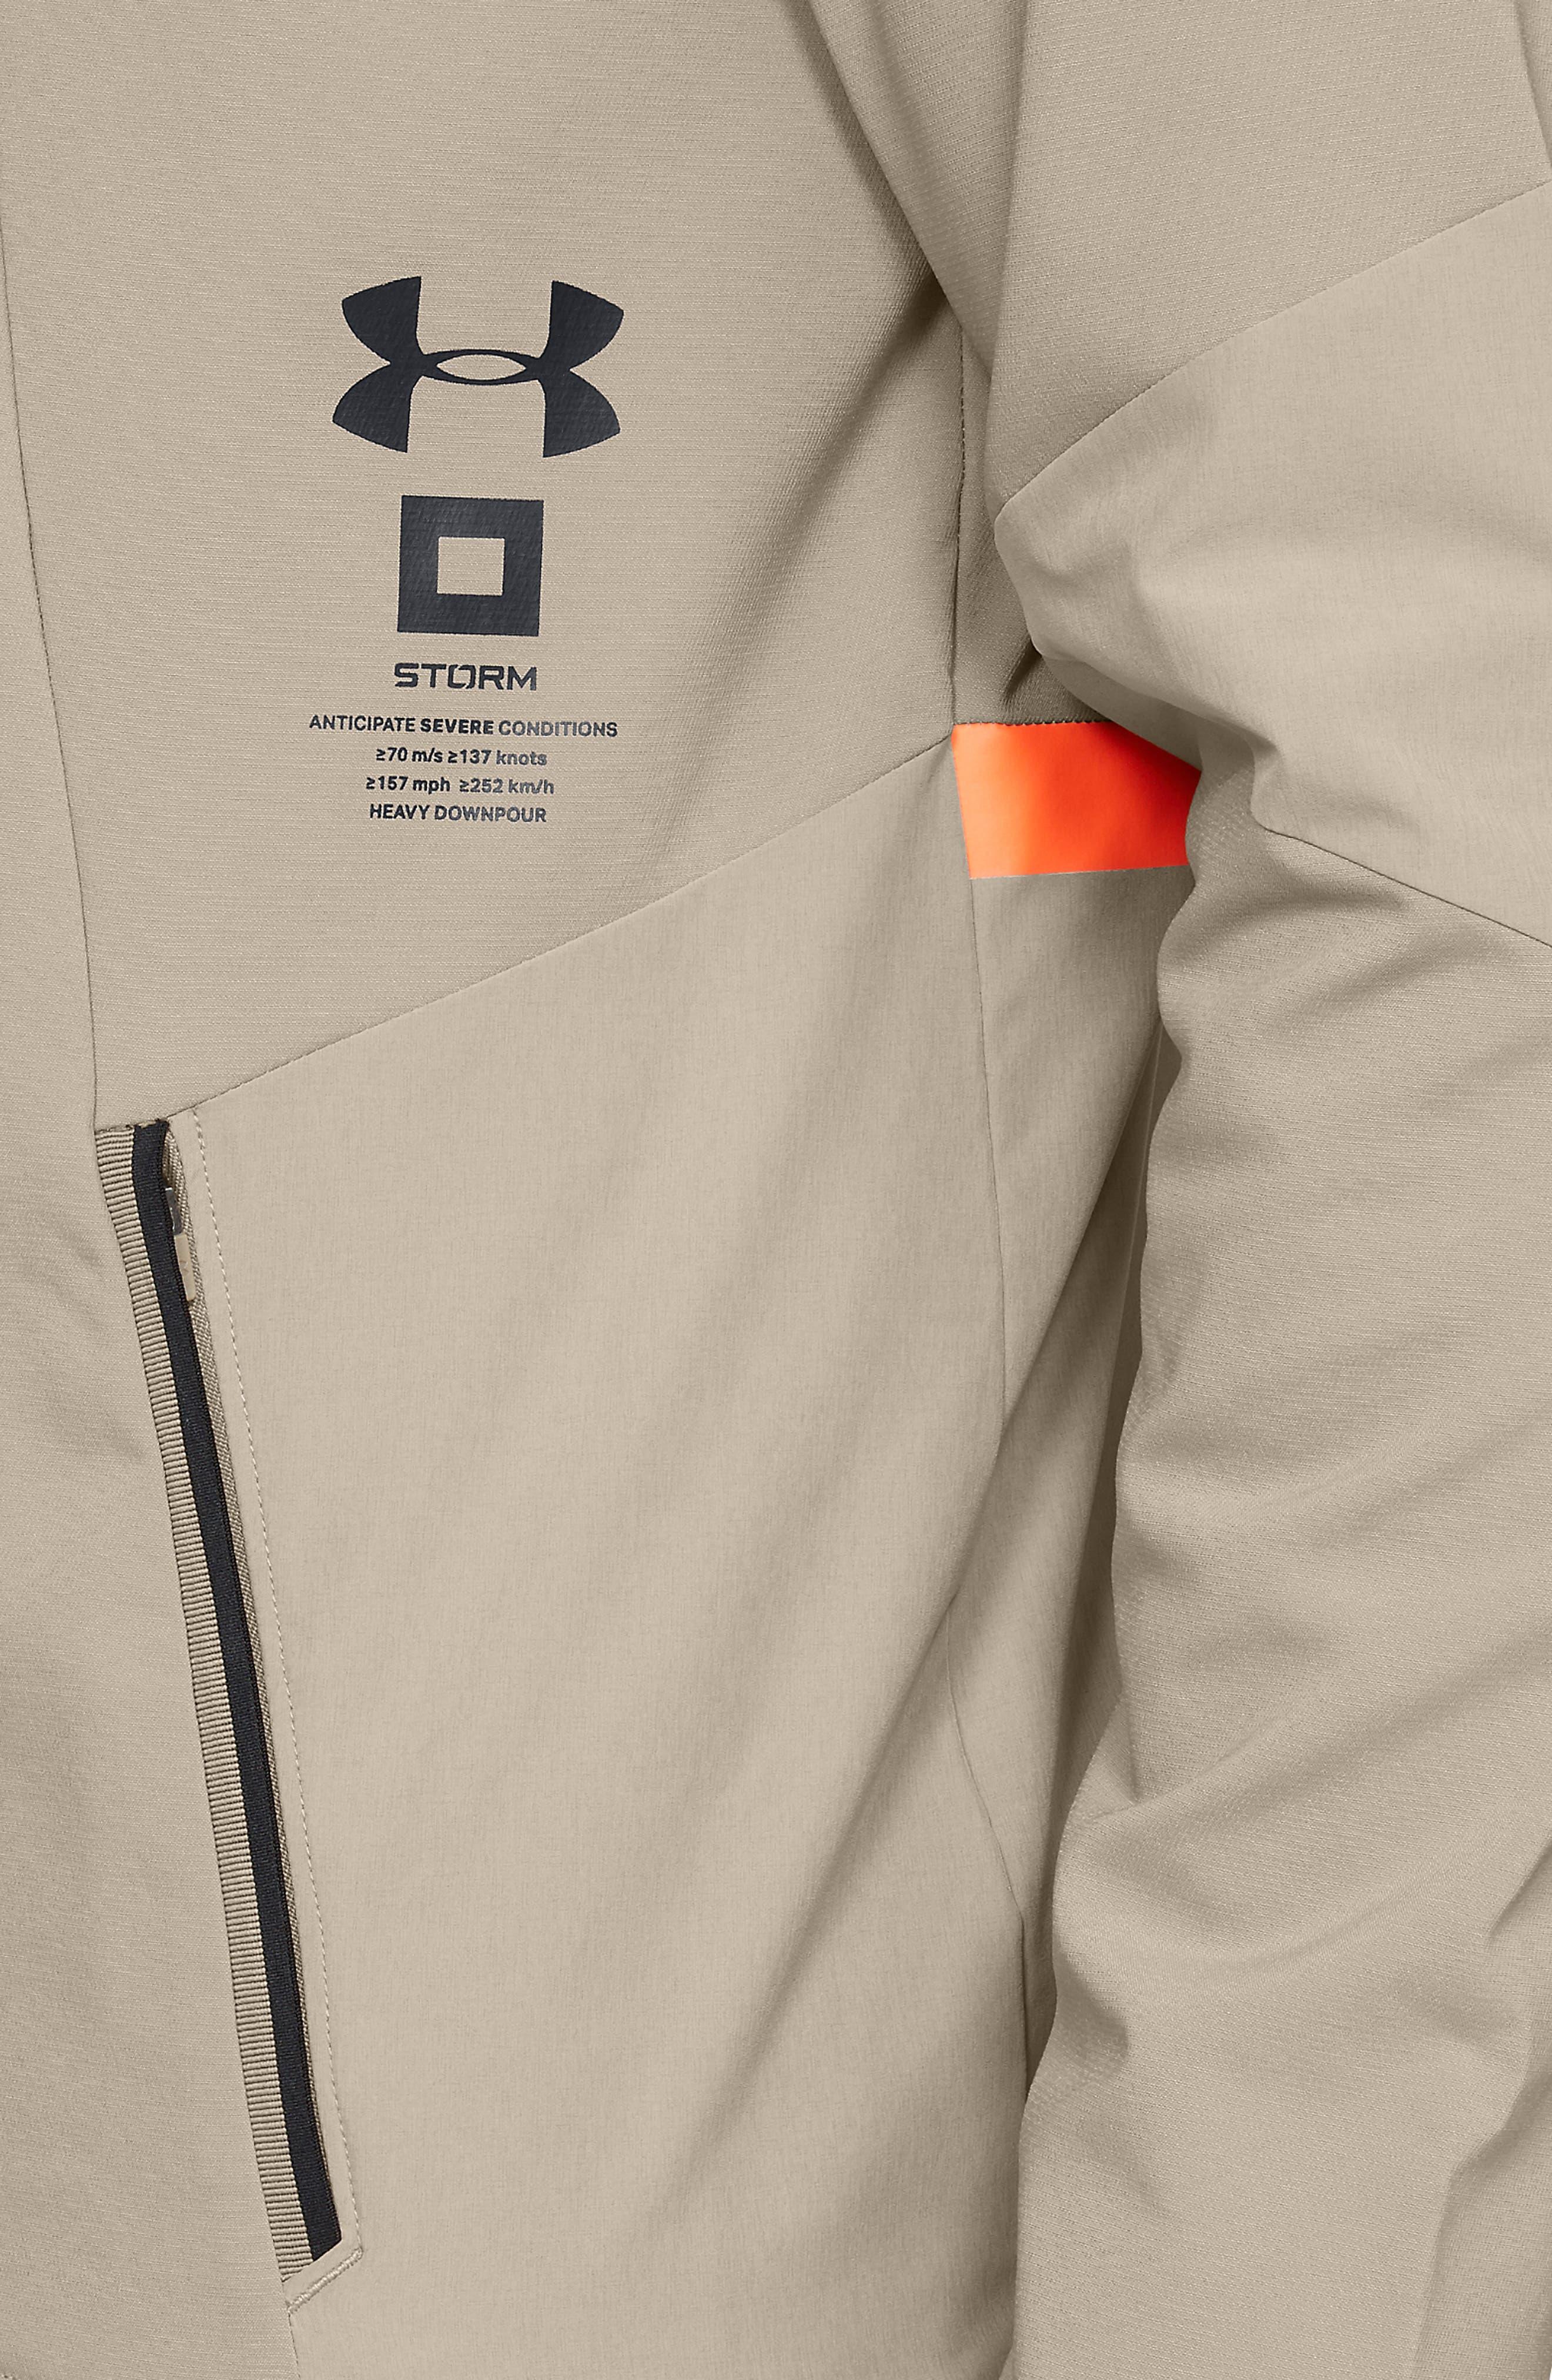 Storm Cyclone Water Repellent Hooded Jacket,                             Alternate thumbnail 4, color,                             CITY KHAKI/ BLACK